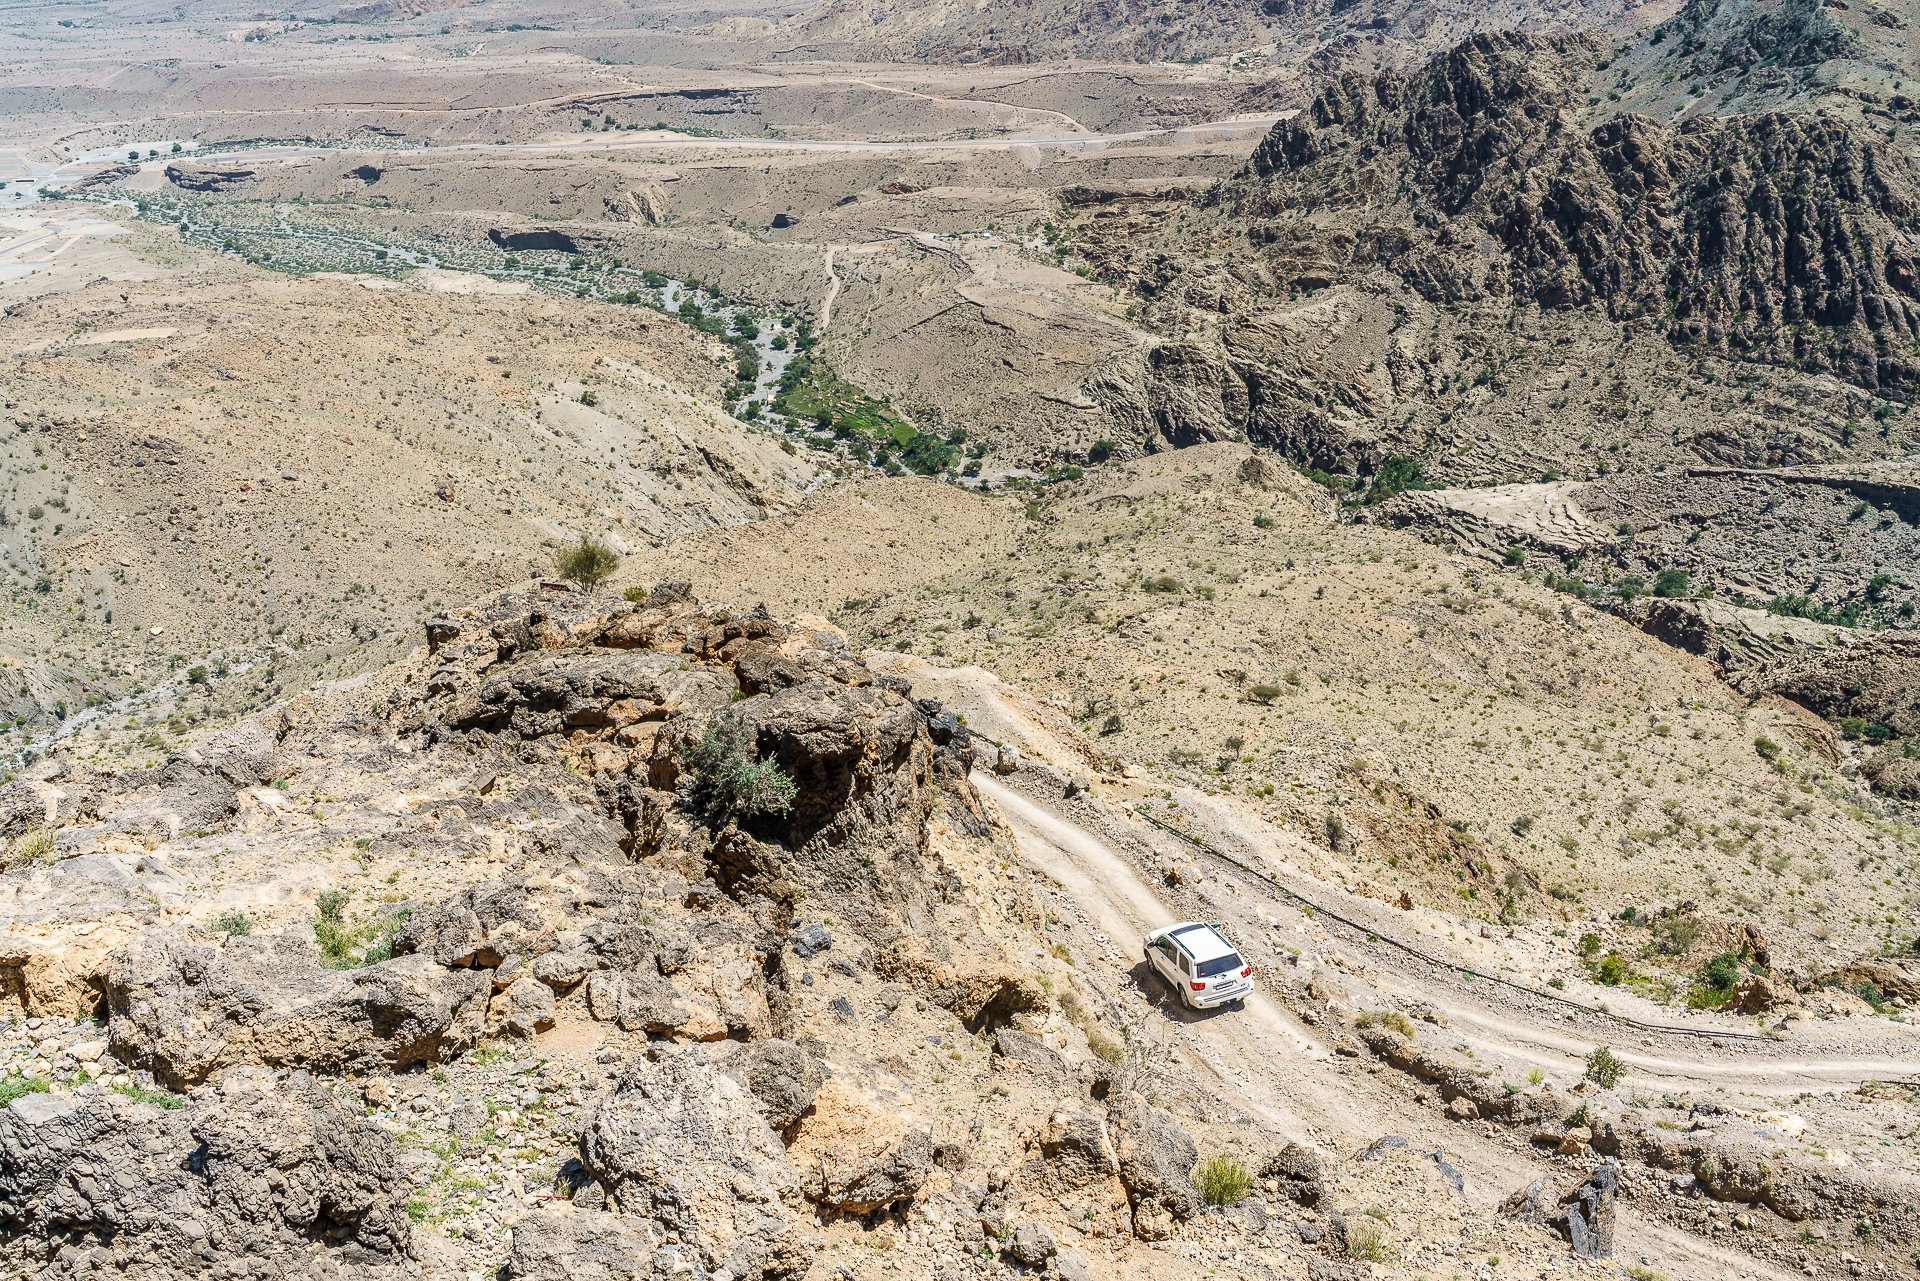 offroad-Wadi-Mistal-Wakan